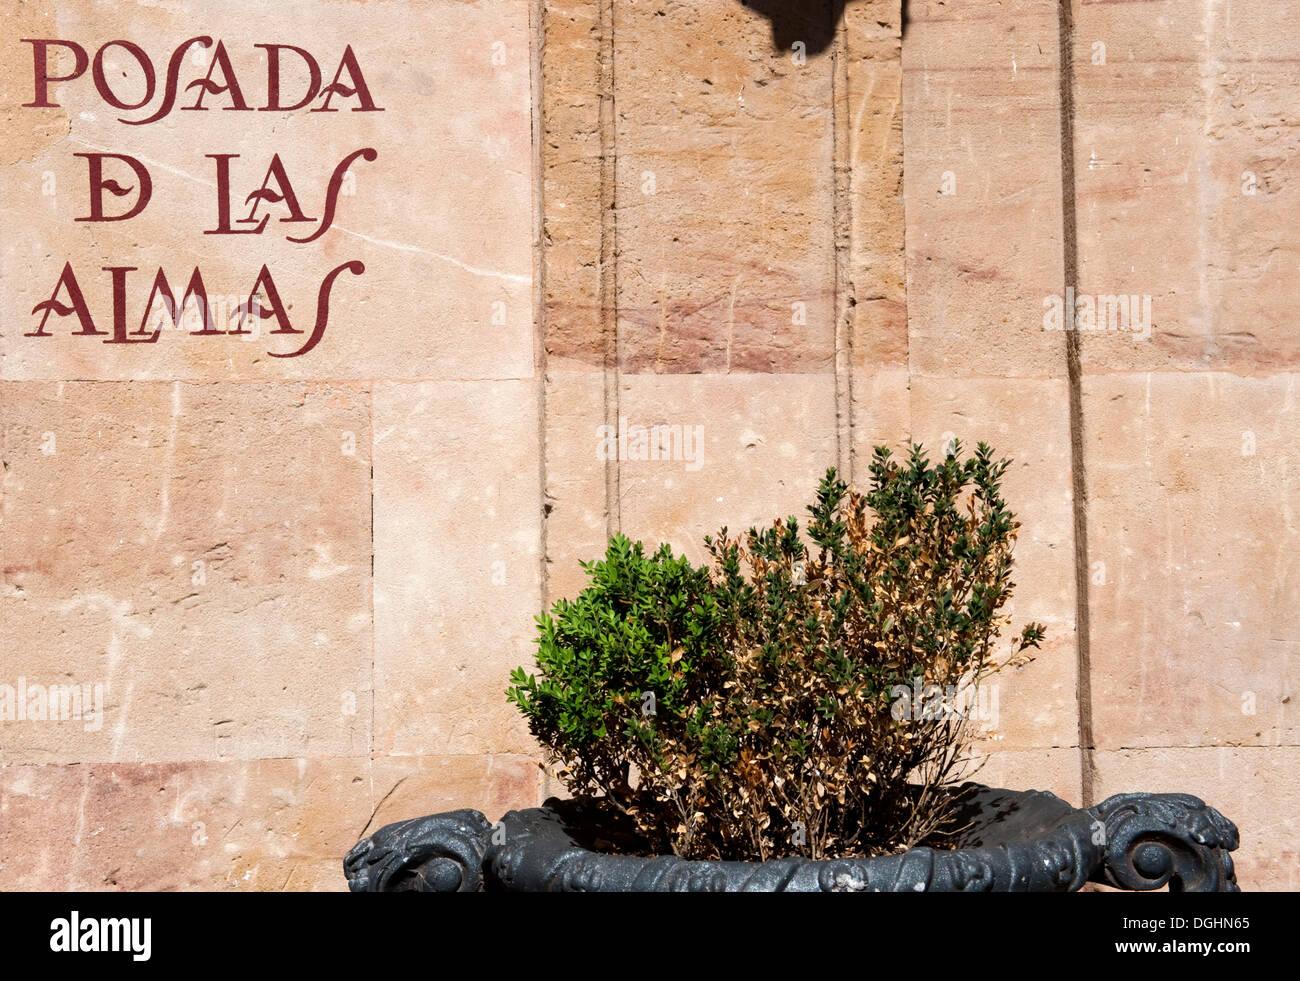 Logo 'Posada de las Almas' written on the bar, Salamanca, Old Castile, Castilla-Leon, Spain, Europe - Stock Image